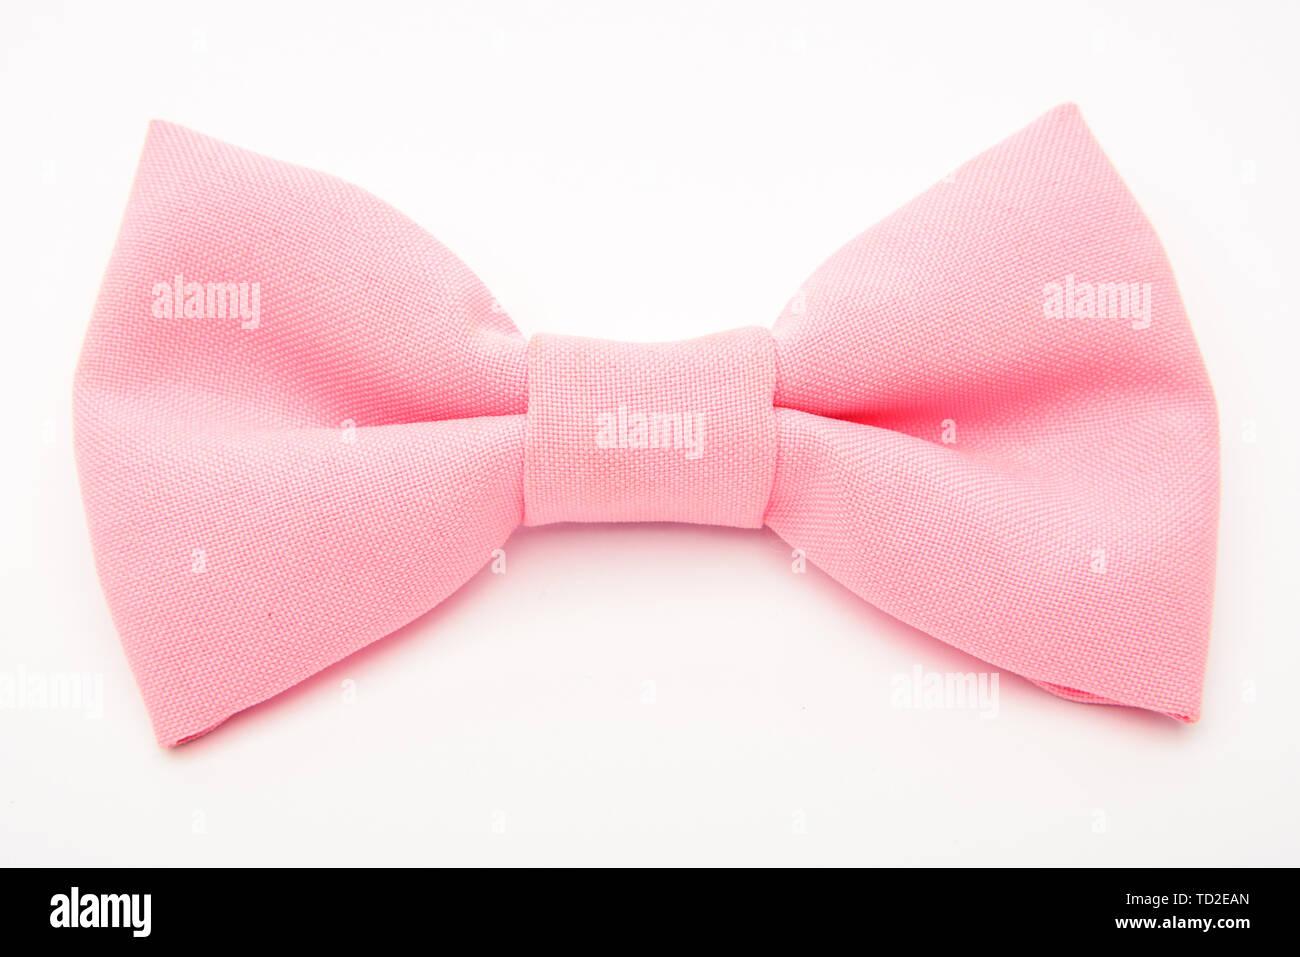 wedding accessories fashion accessory